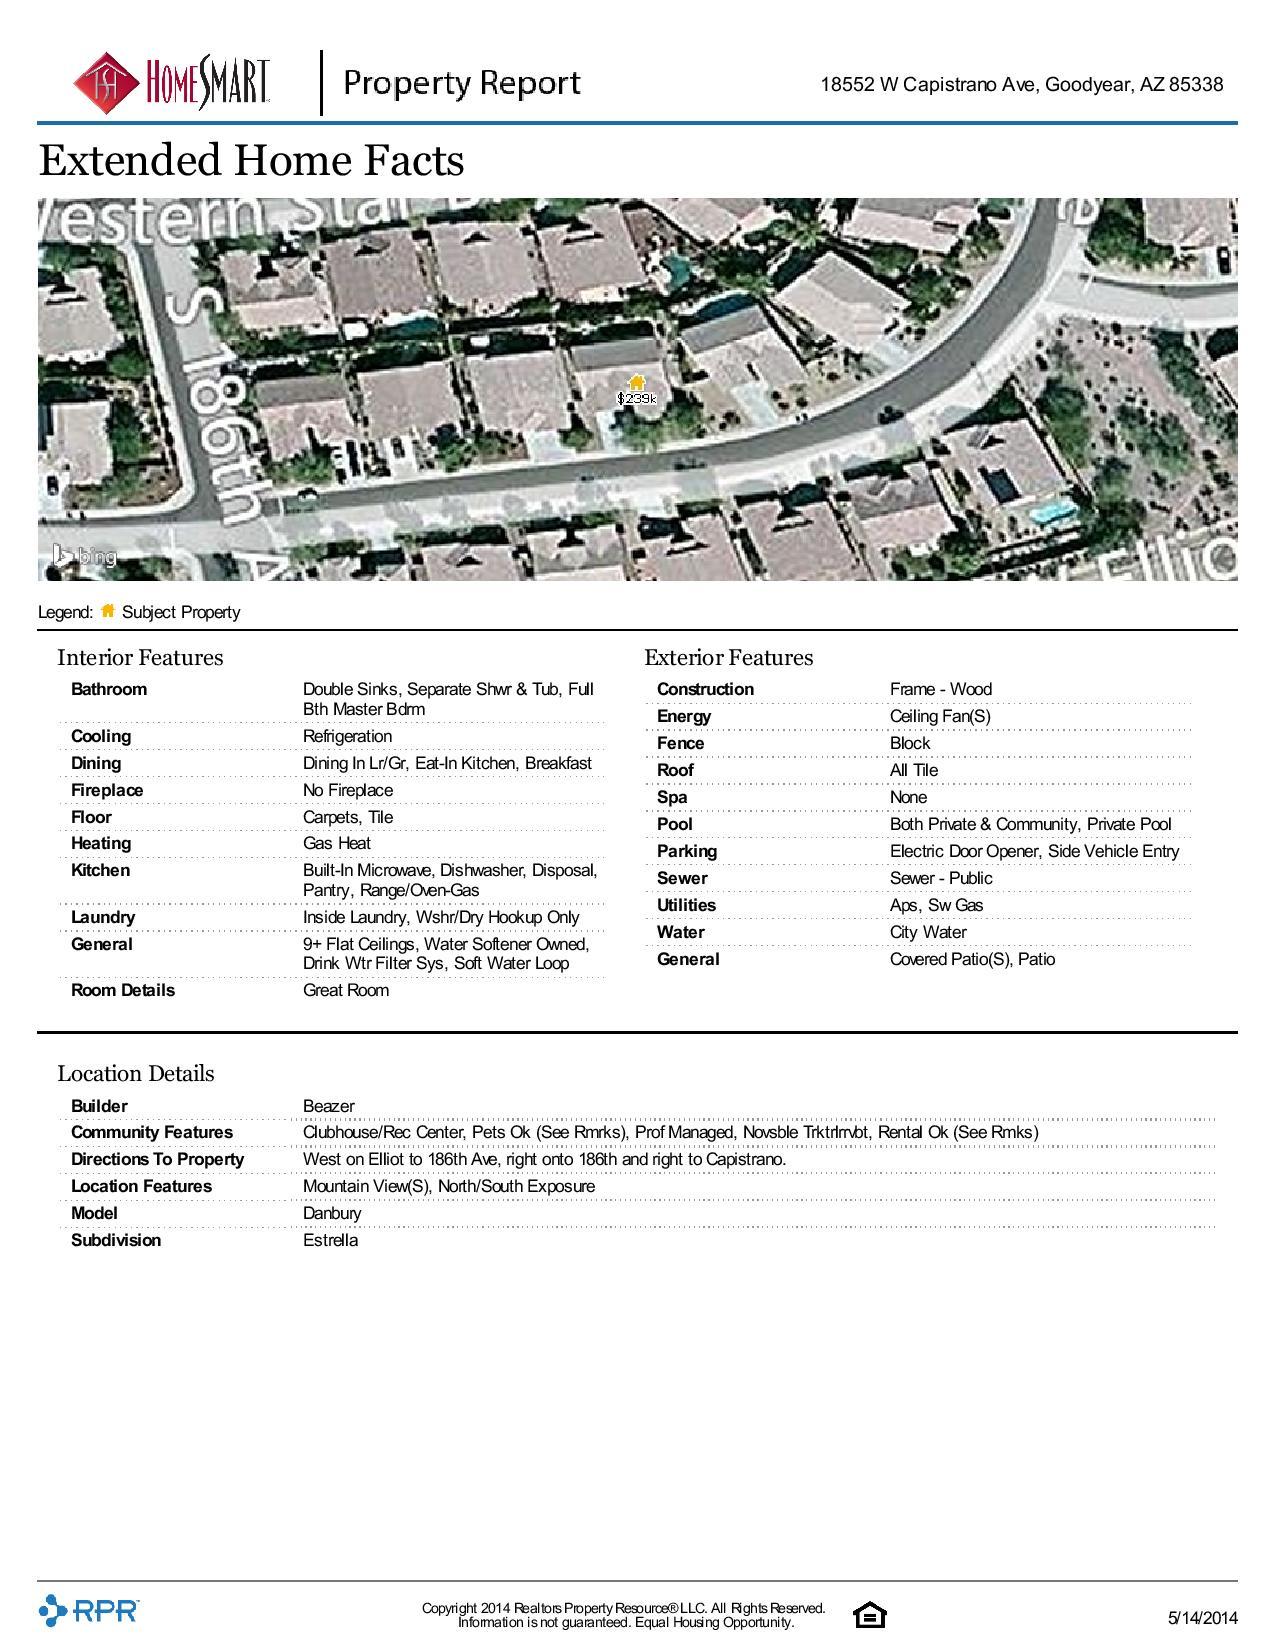 18552-W-Capistrano-Ave-Goodyear-AZ-85338-page-004